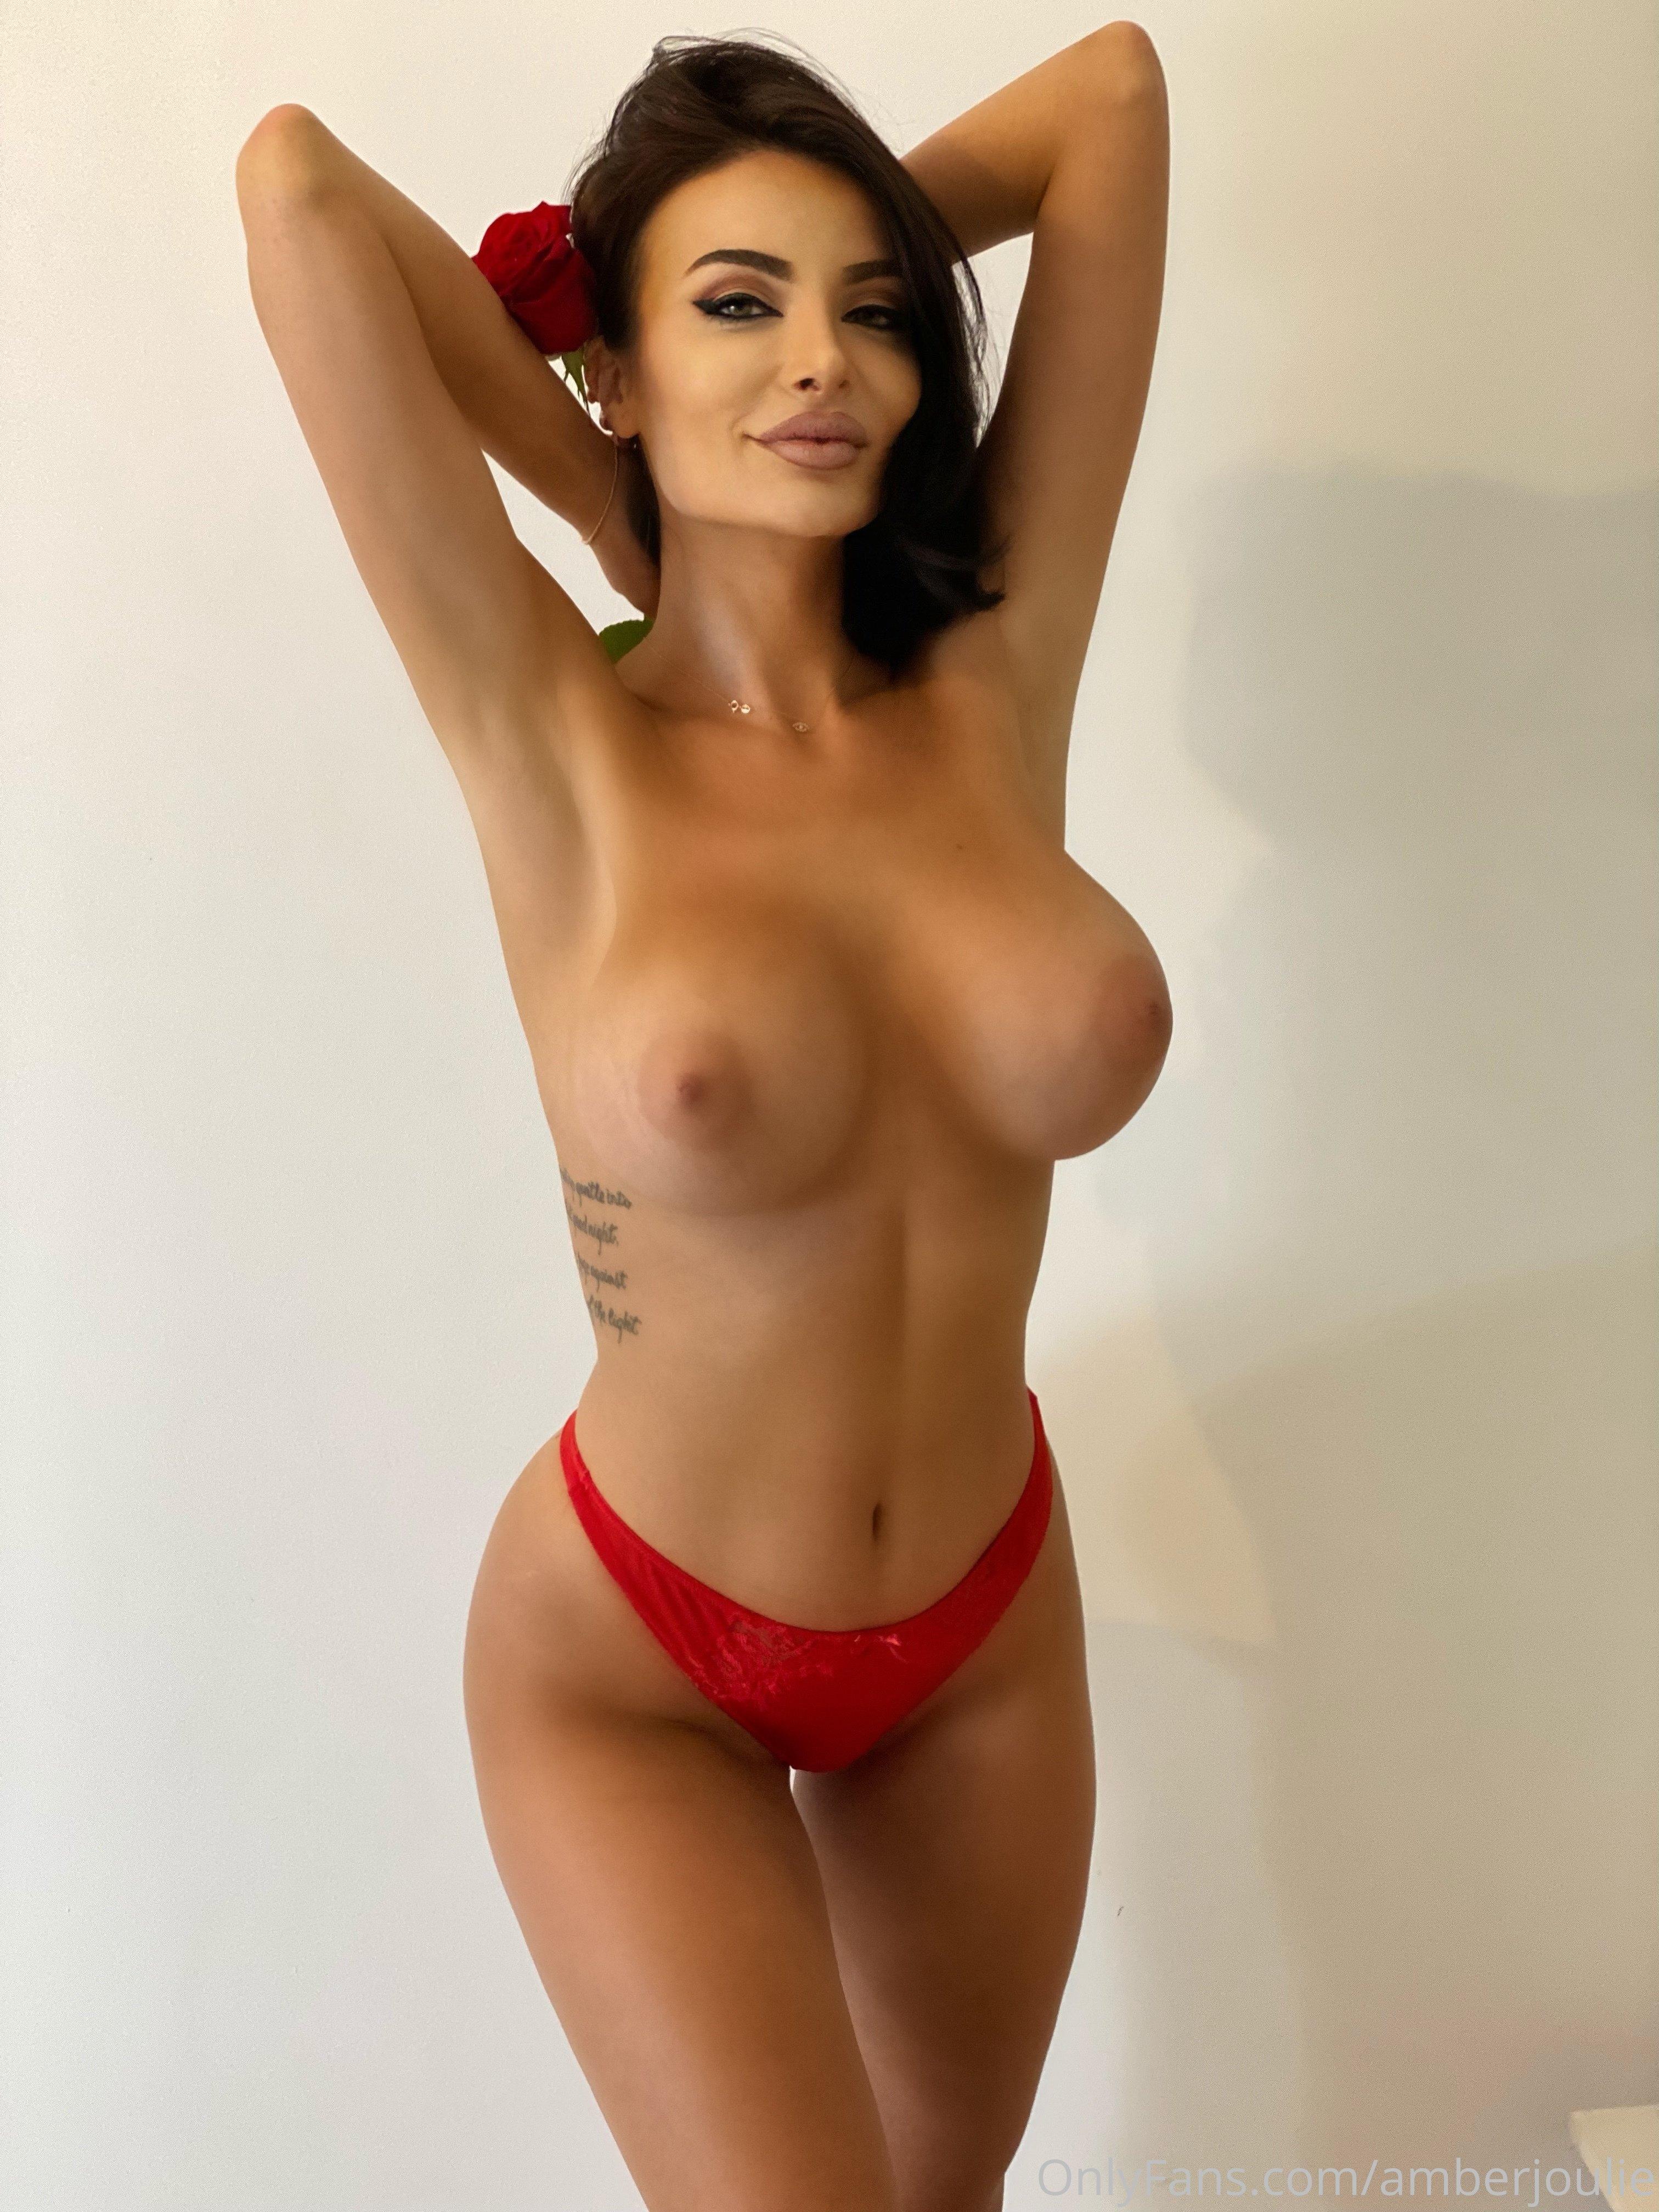 @amberjoulie nude photo 58